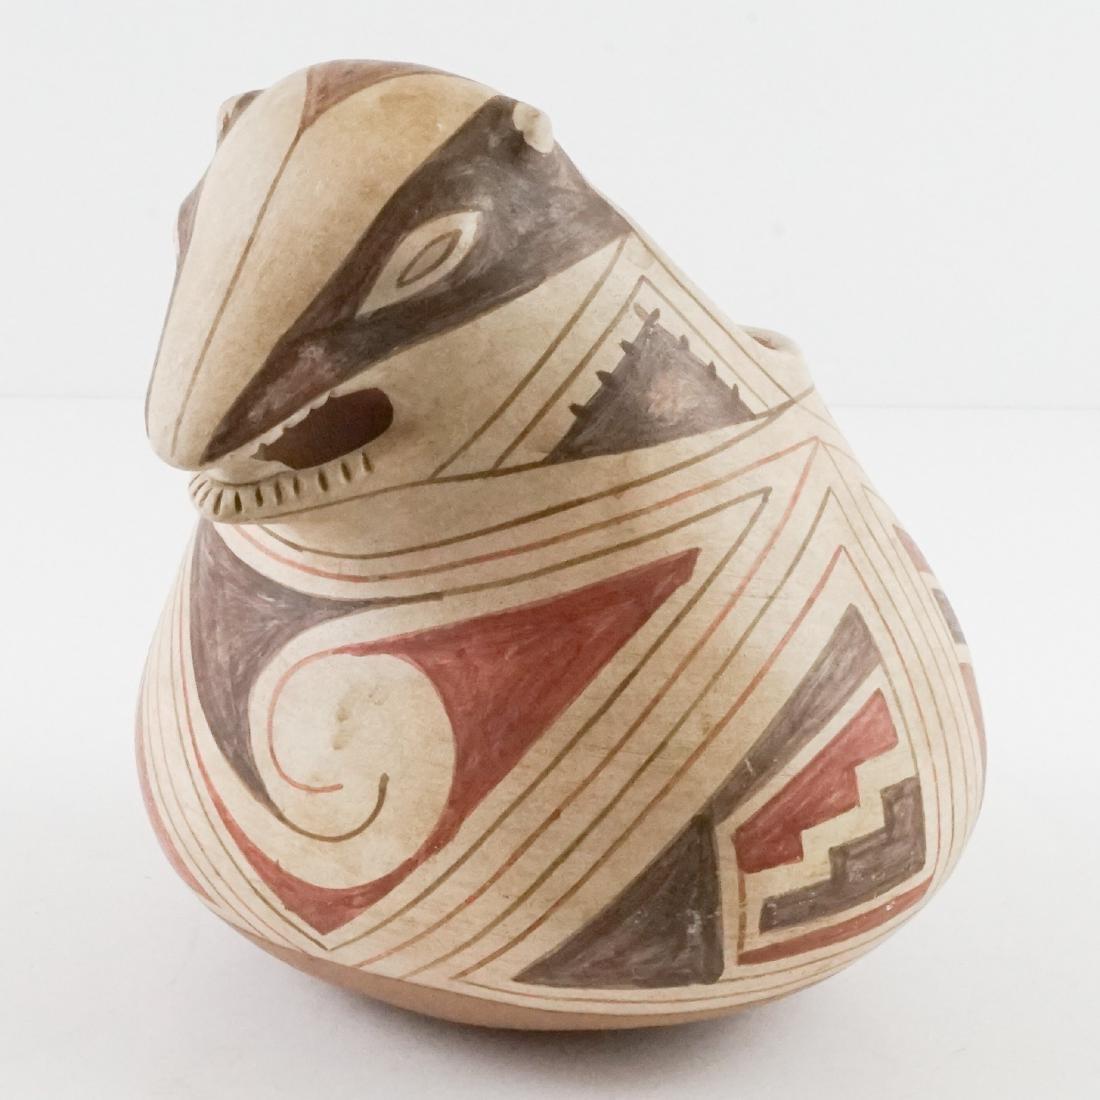 A Figural Pottery Vessel